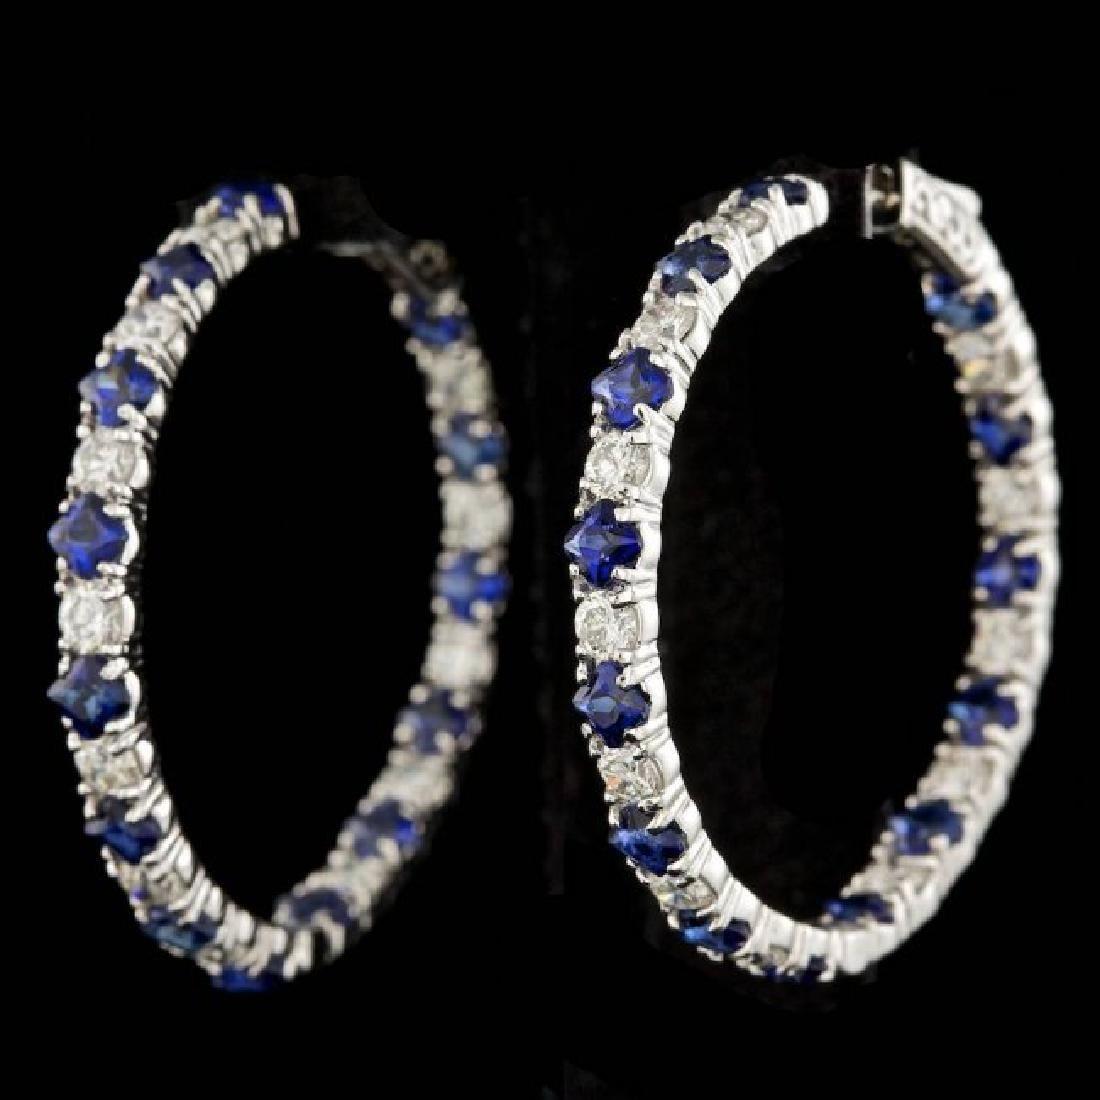 14k Gold 6.00ct Sapphire 3.20ct Diamond Earrings